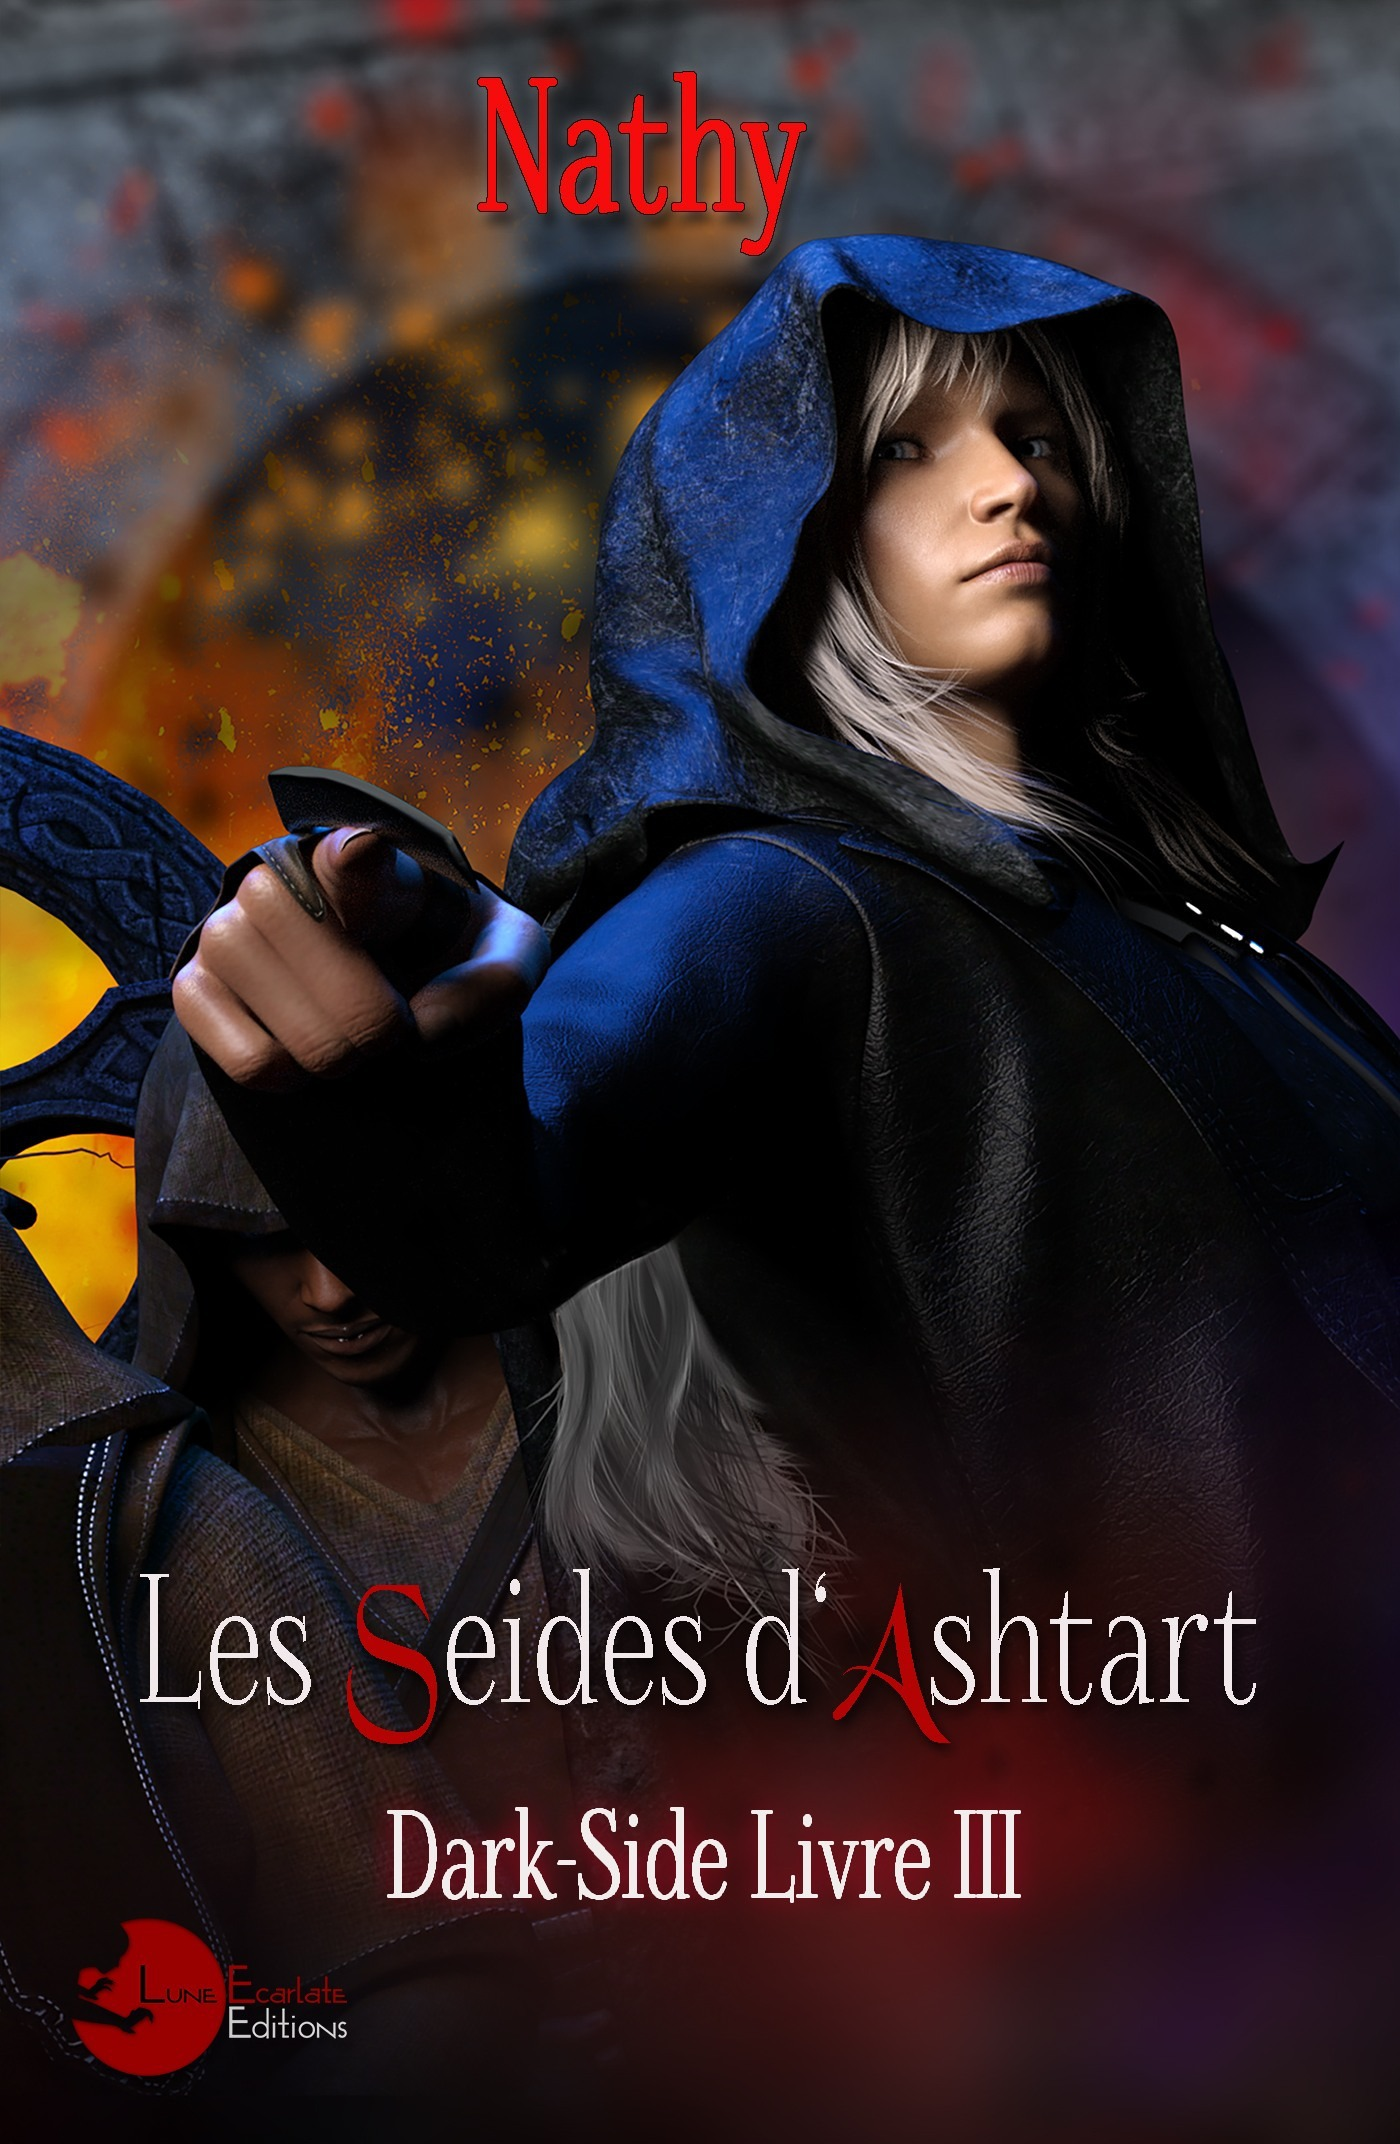 Dark-side, les seides d'ashtart, livre 3